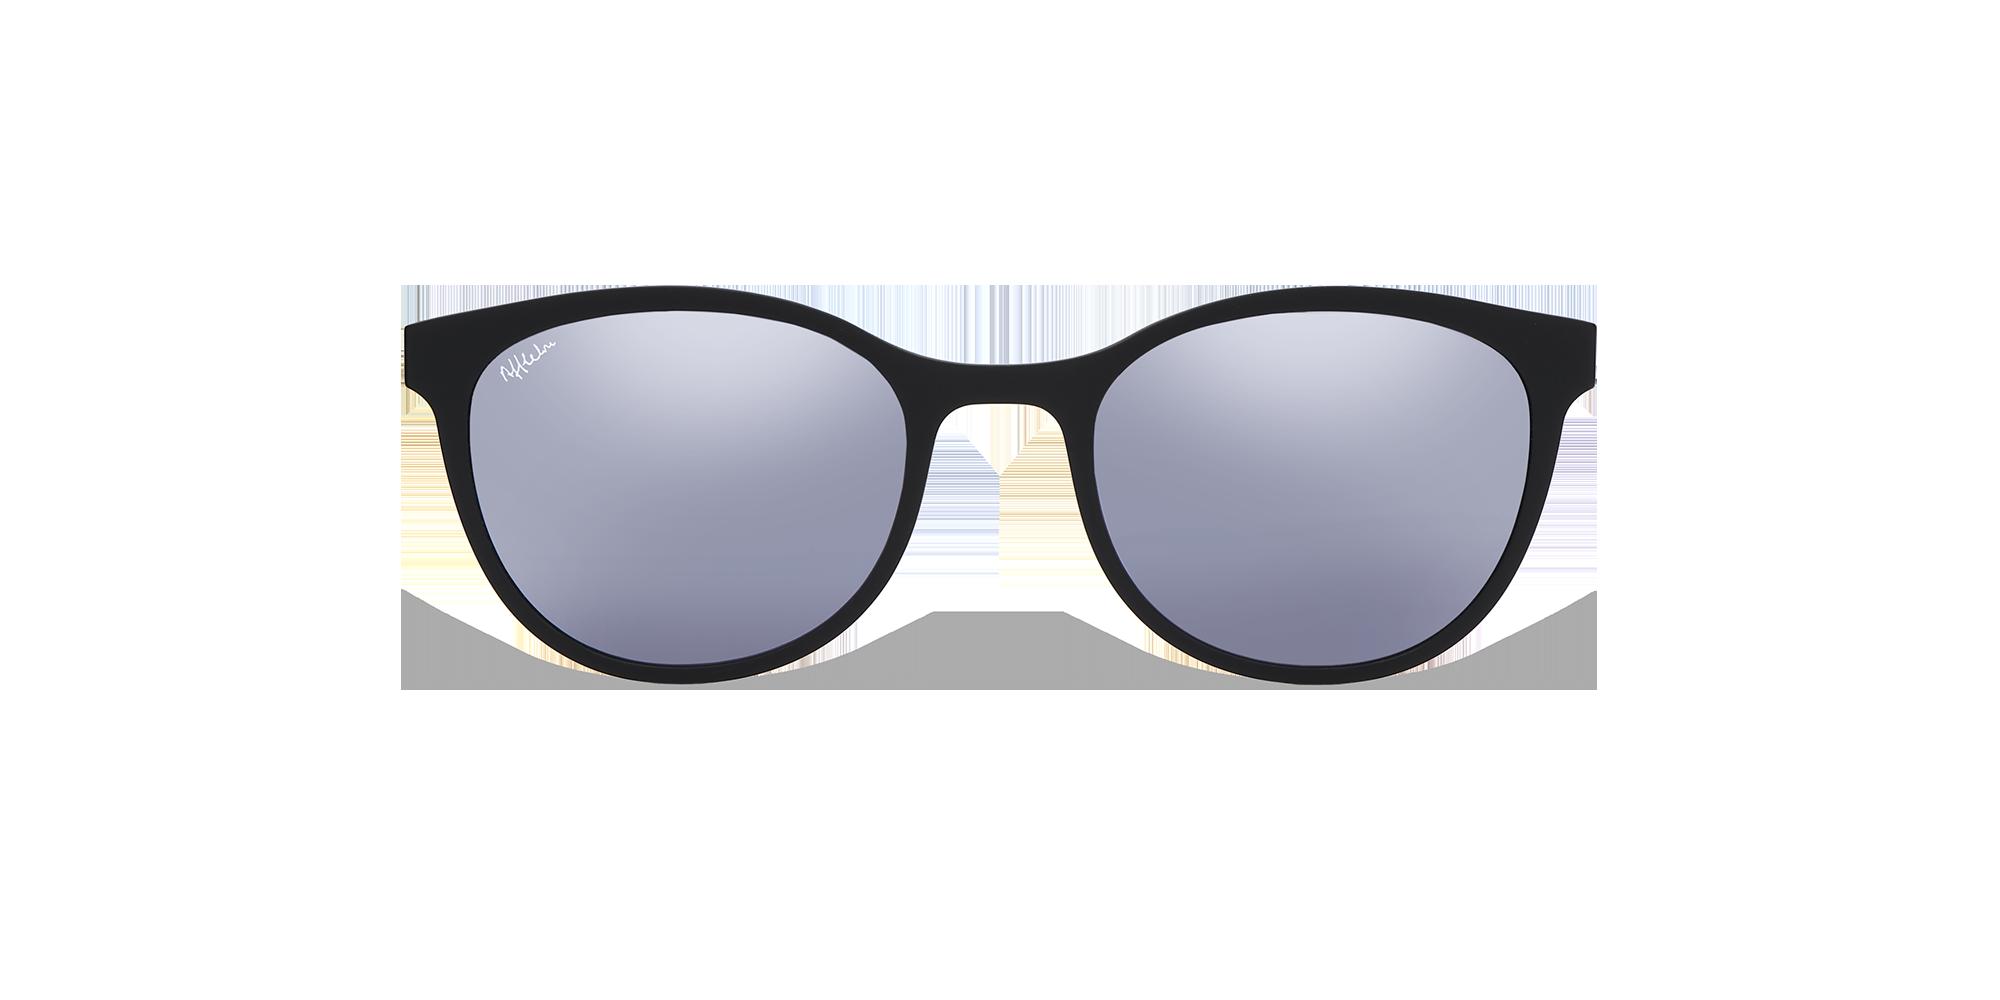 afflelou/france/products/smart_clip/clips_glasses/TMK45S4BK014818.png